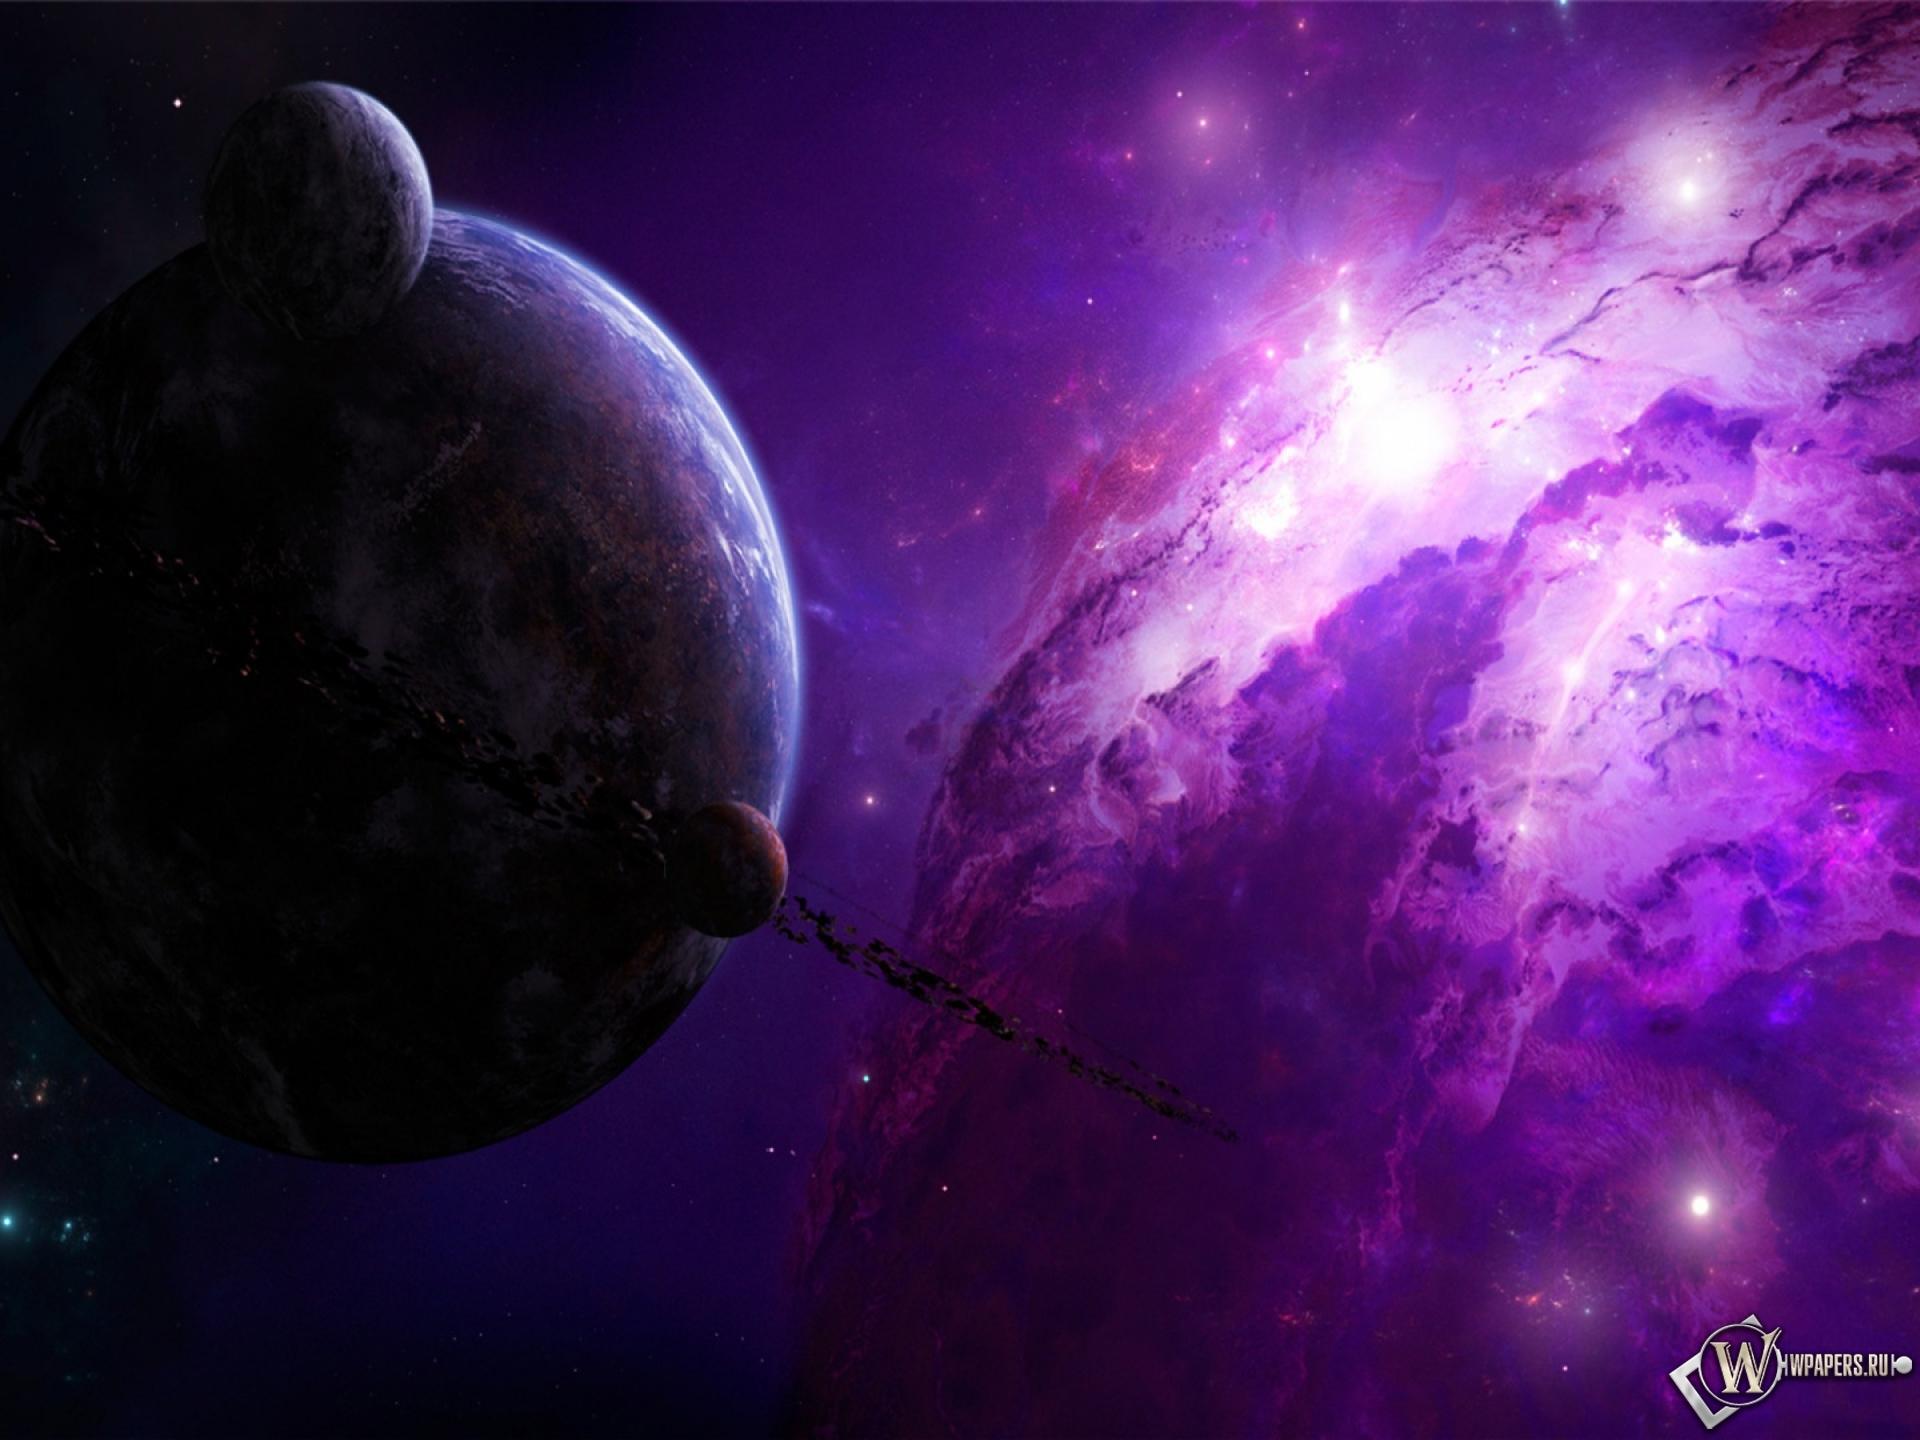 universe hd images - 1200×675